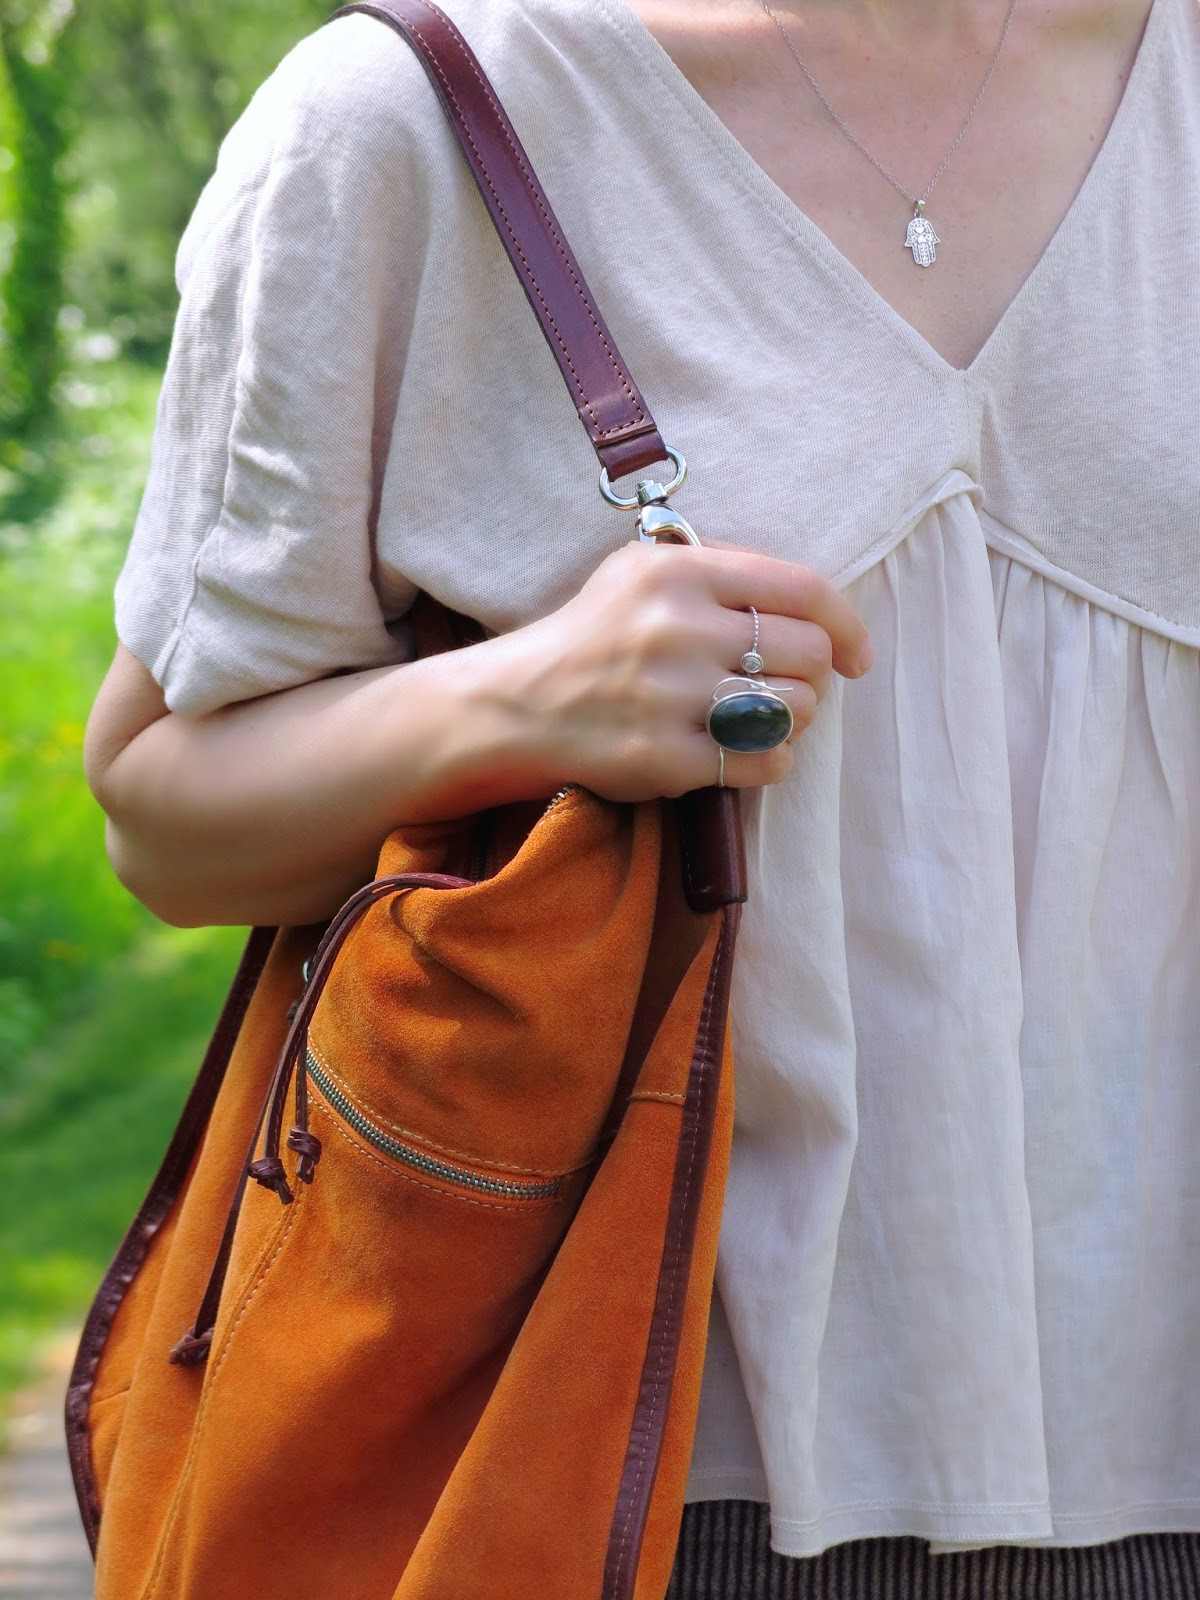 Zara top, orange bag, hamsa necklace, labradorite ring